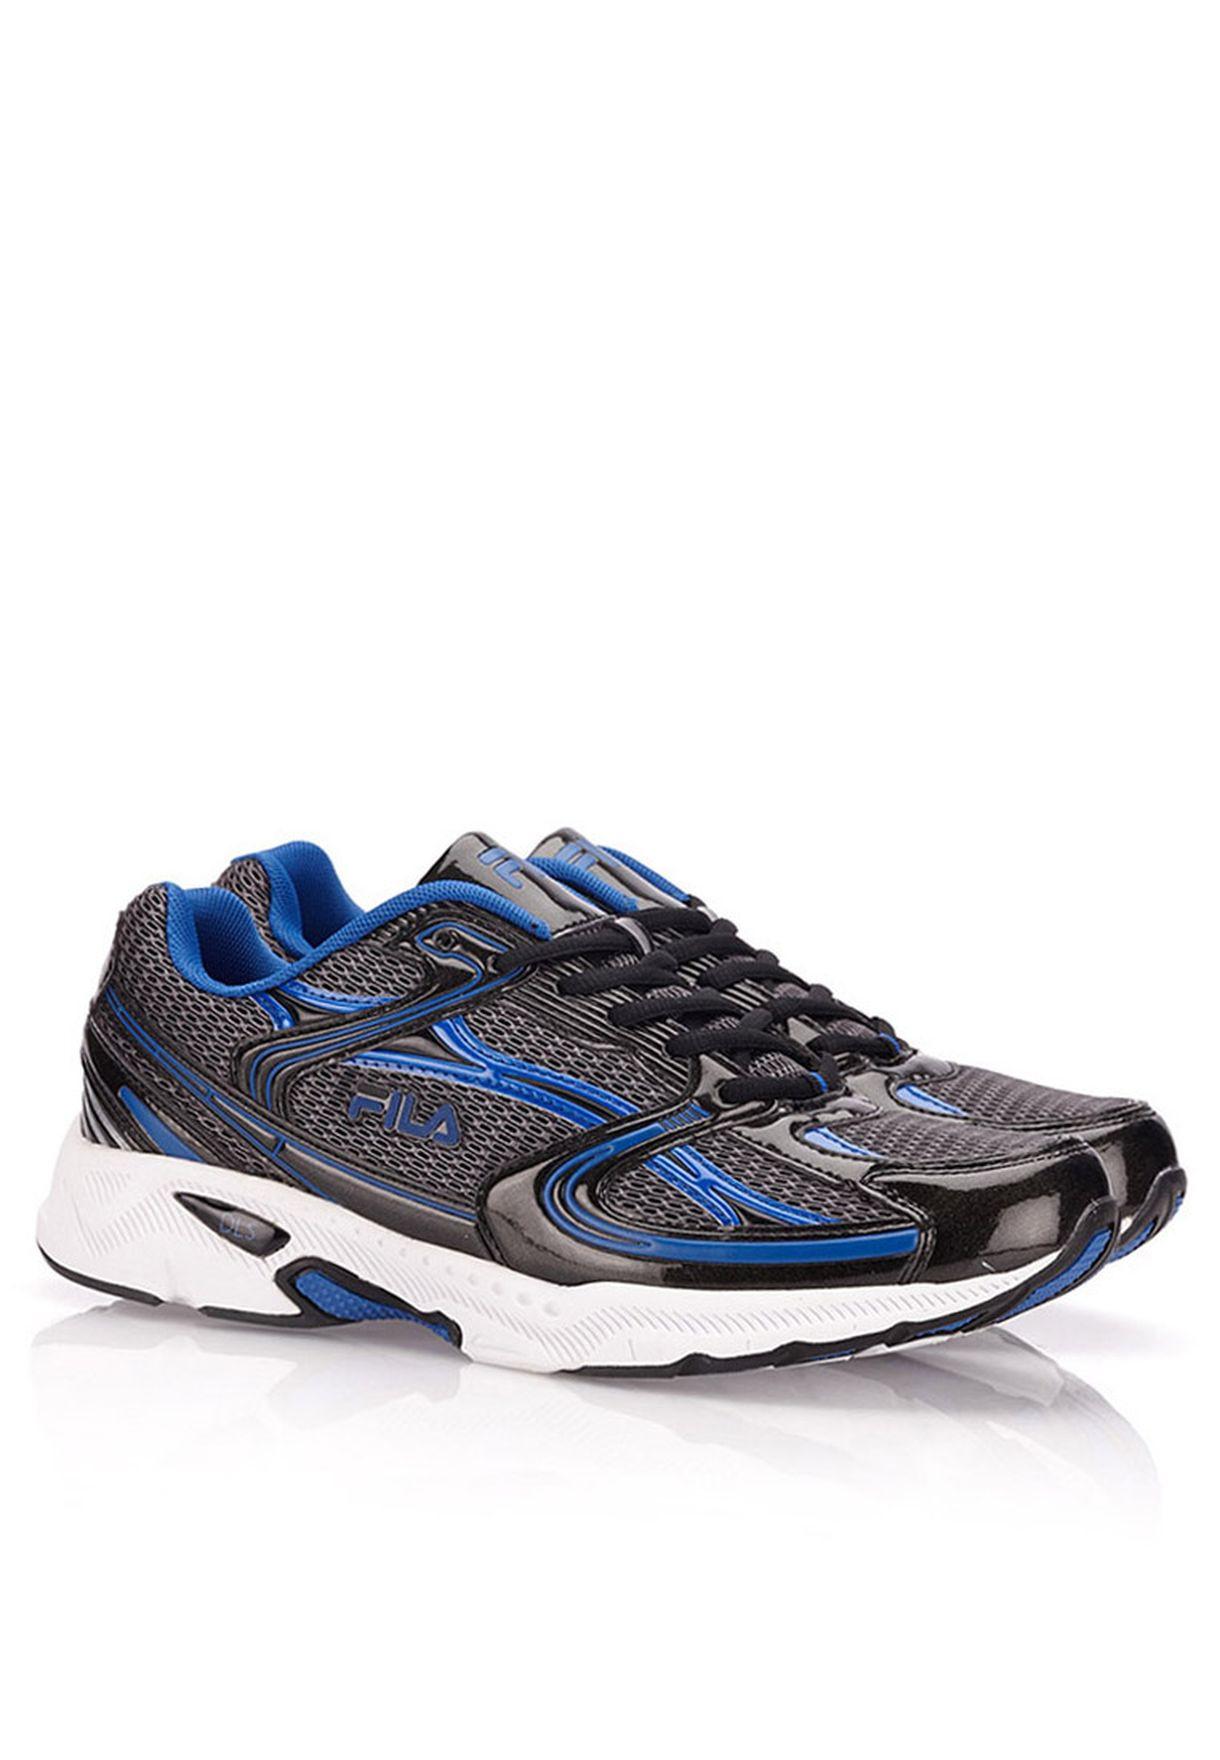 1d1d69f66fa6 Shop Fila multicolor Sports Shoes 391R196-201 for Men in Saudi ...